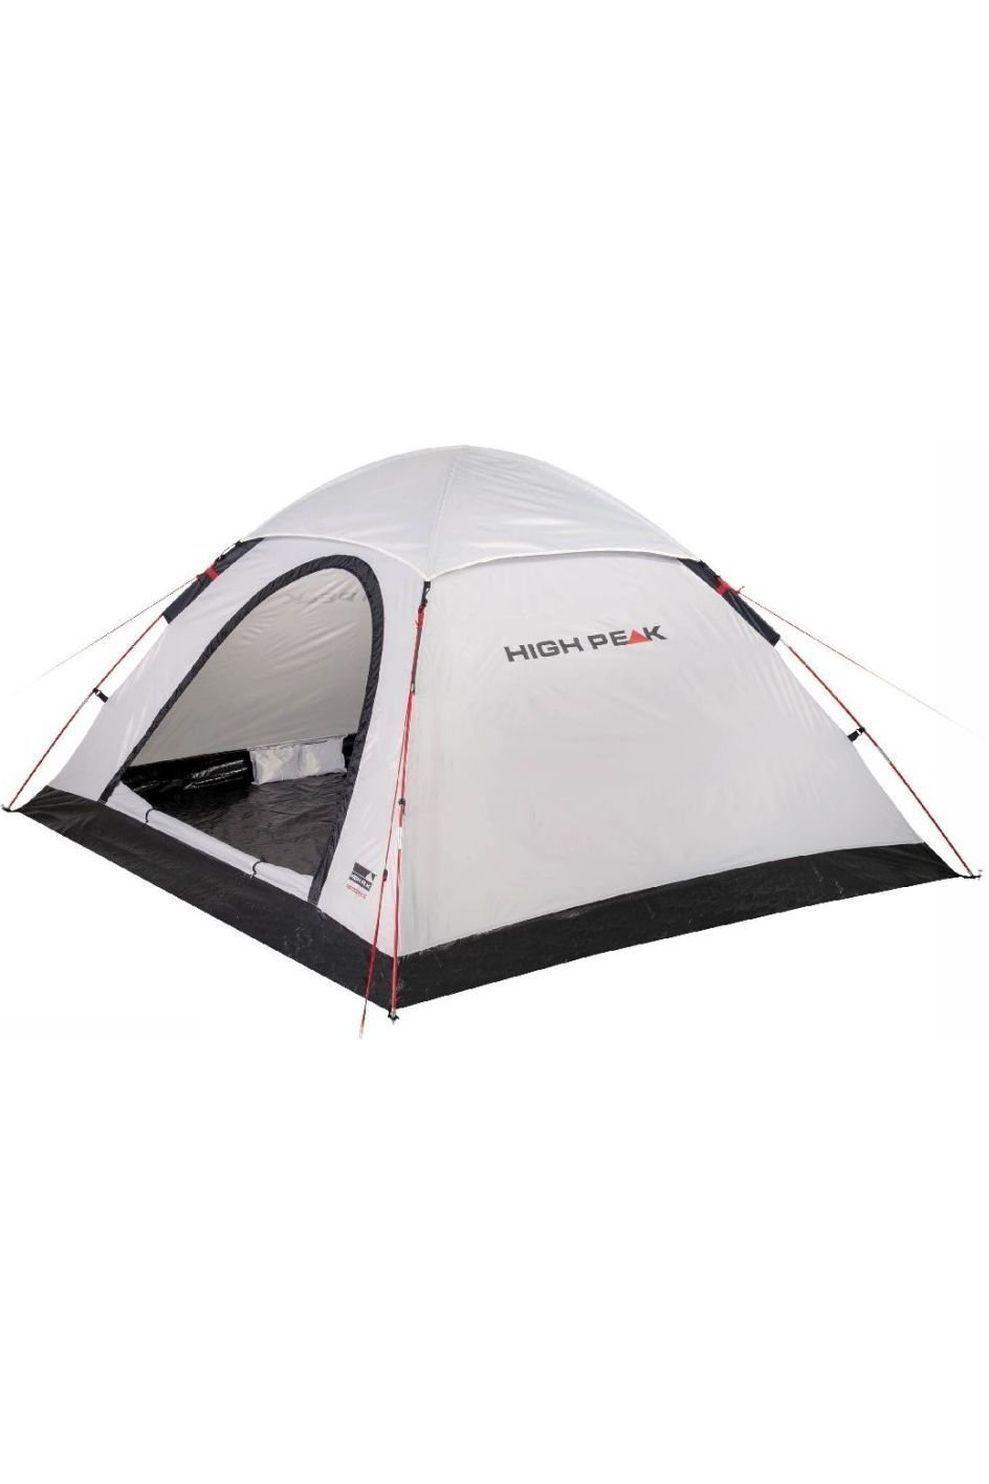 High Peak Tent Monodome Xl Grijs